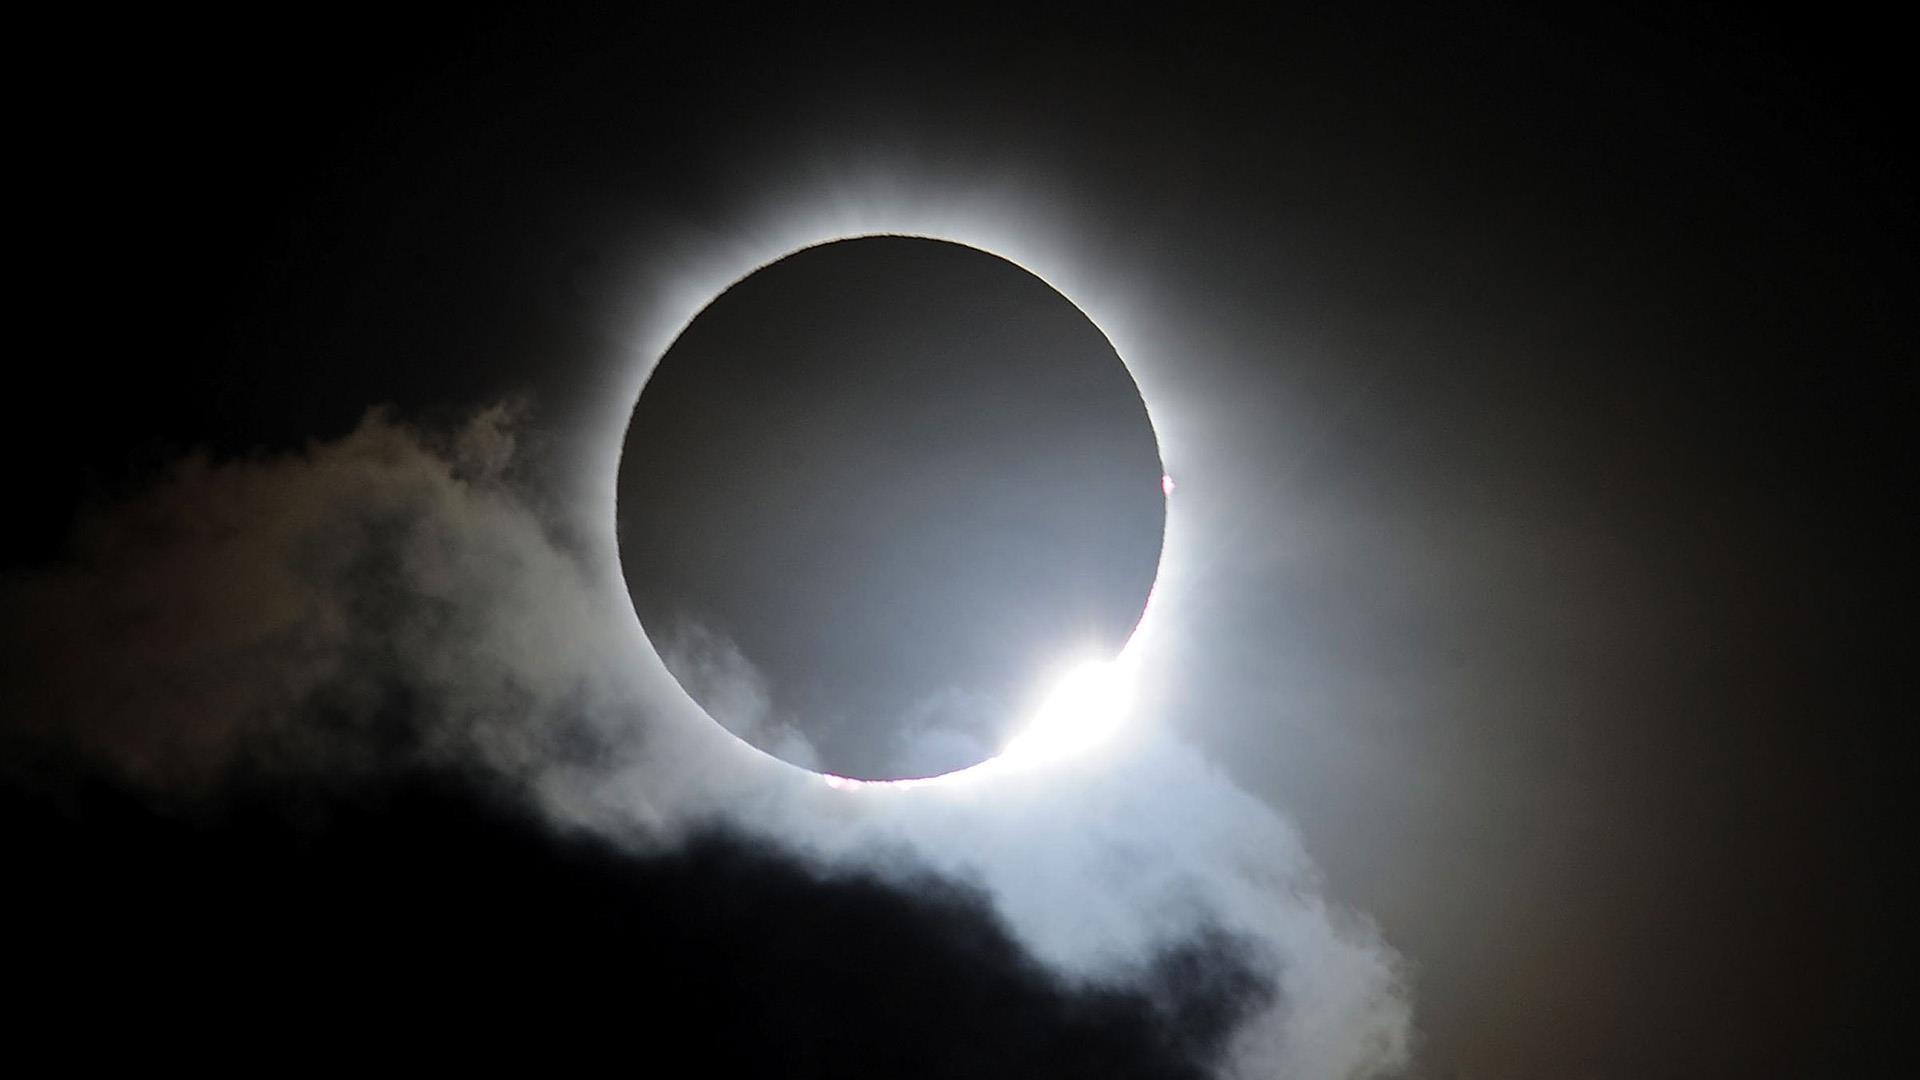 a_mach_space_eclipsepath_170124.jpg